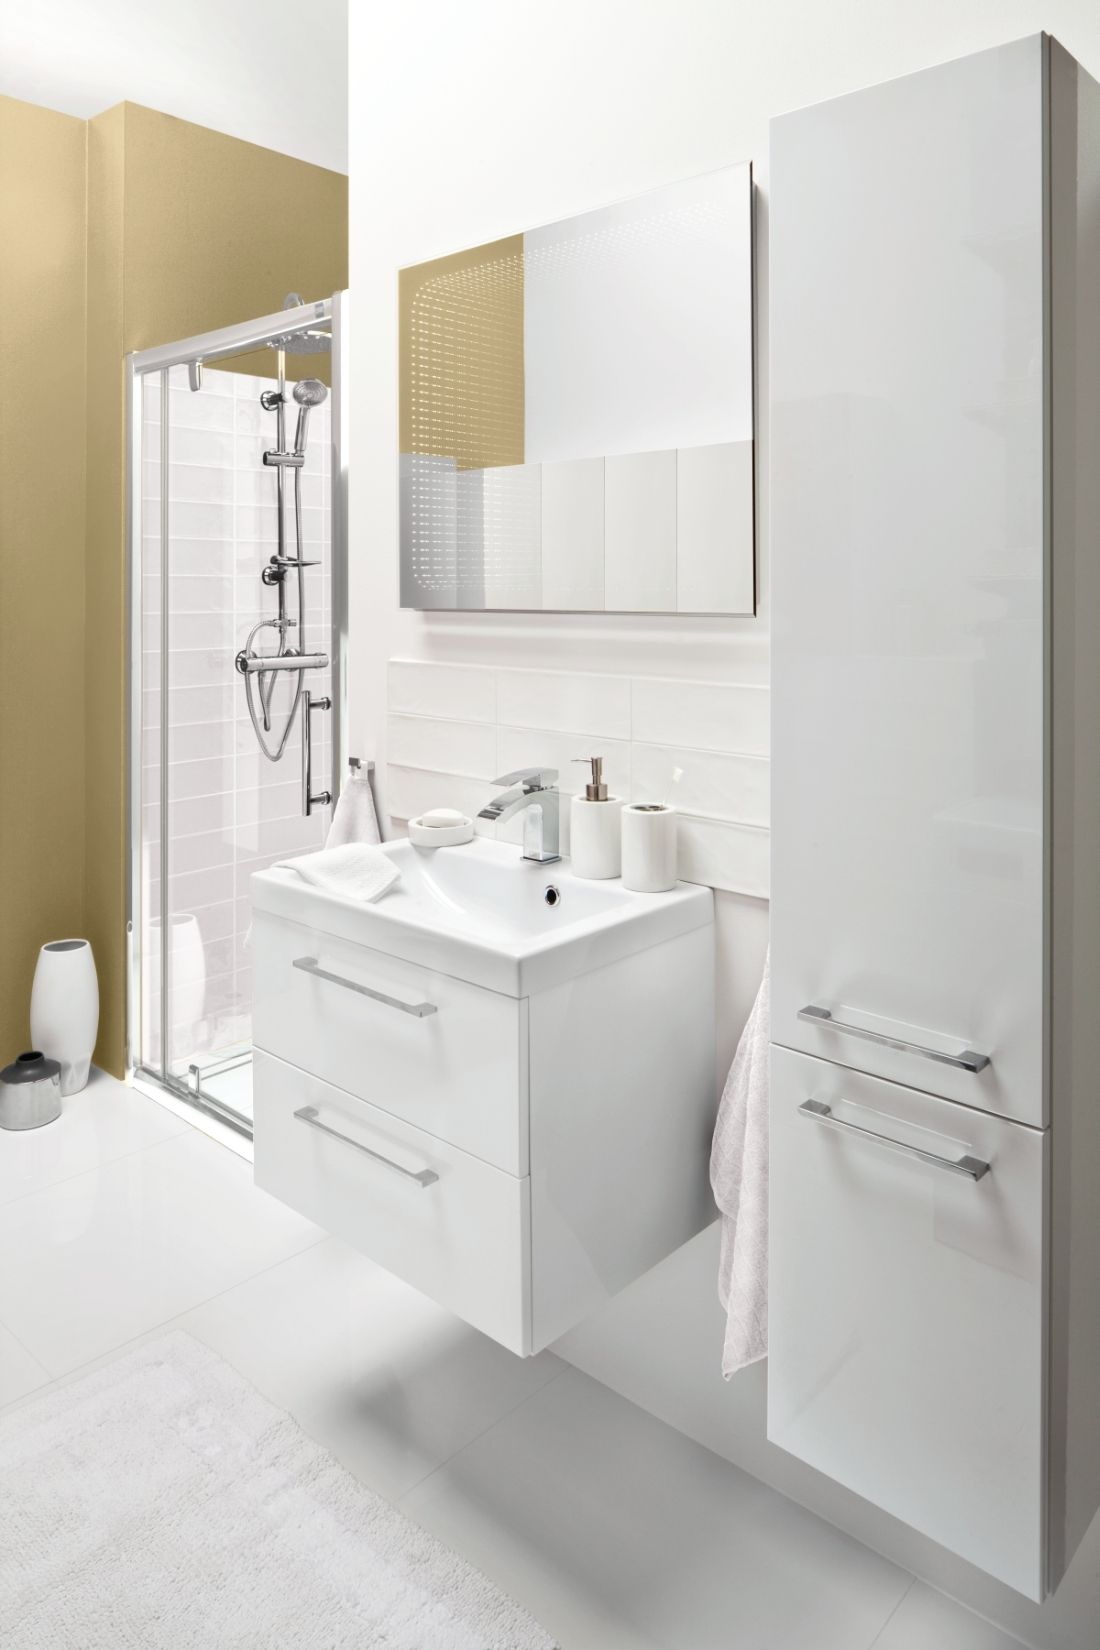 Sesja Lena Bialy 502558 502666 Aranz 01 Jpg Obraz Jpeg 1100 1650 Pikseli Skala 35 Vanity Single Vanity Bathroom Vanity